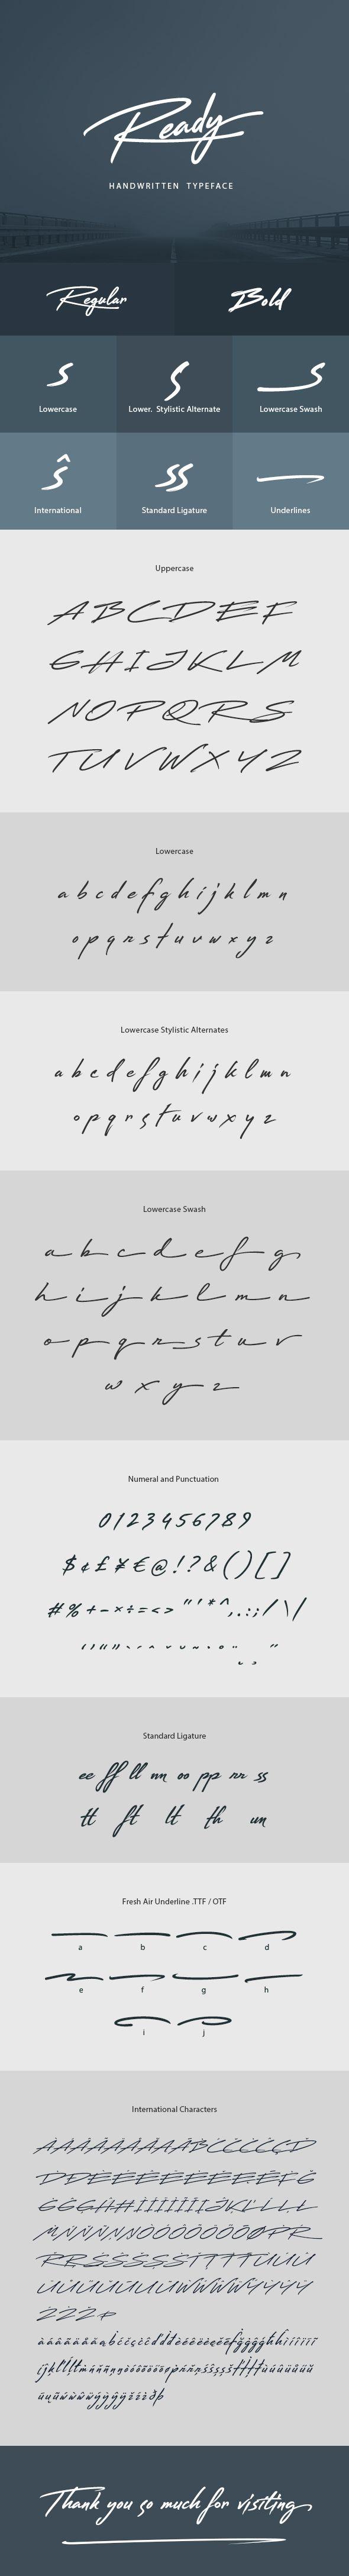 Ready Handwritten Font - #Handwriting #Fonts Download here:  https://graphicriver.net/item/ready-handwritten-font/20327077?ref=alena994